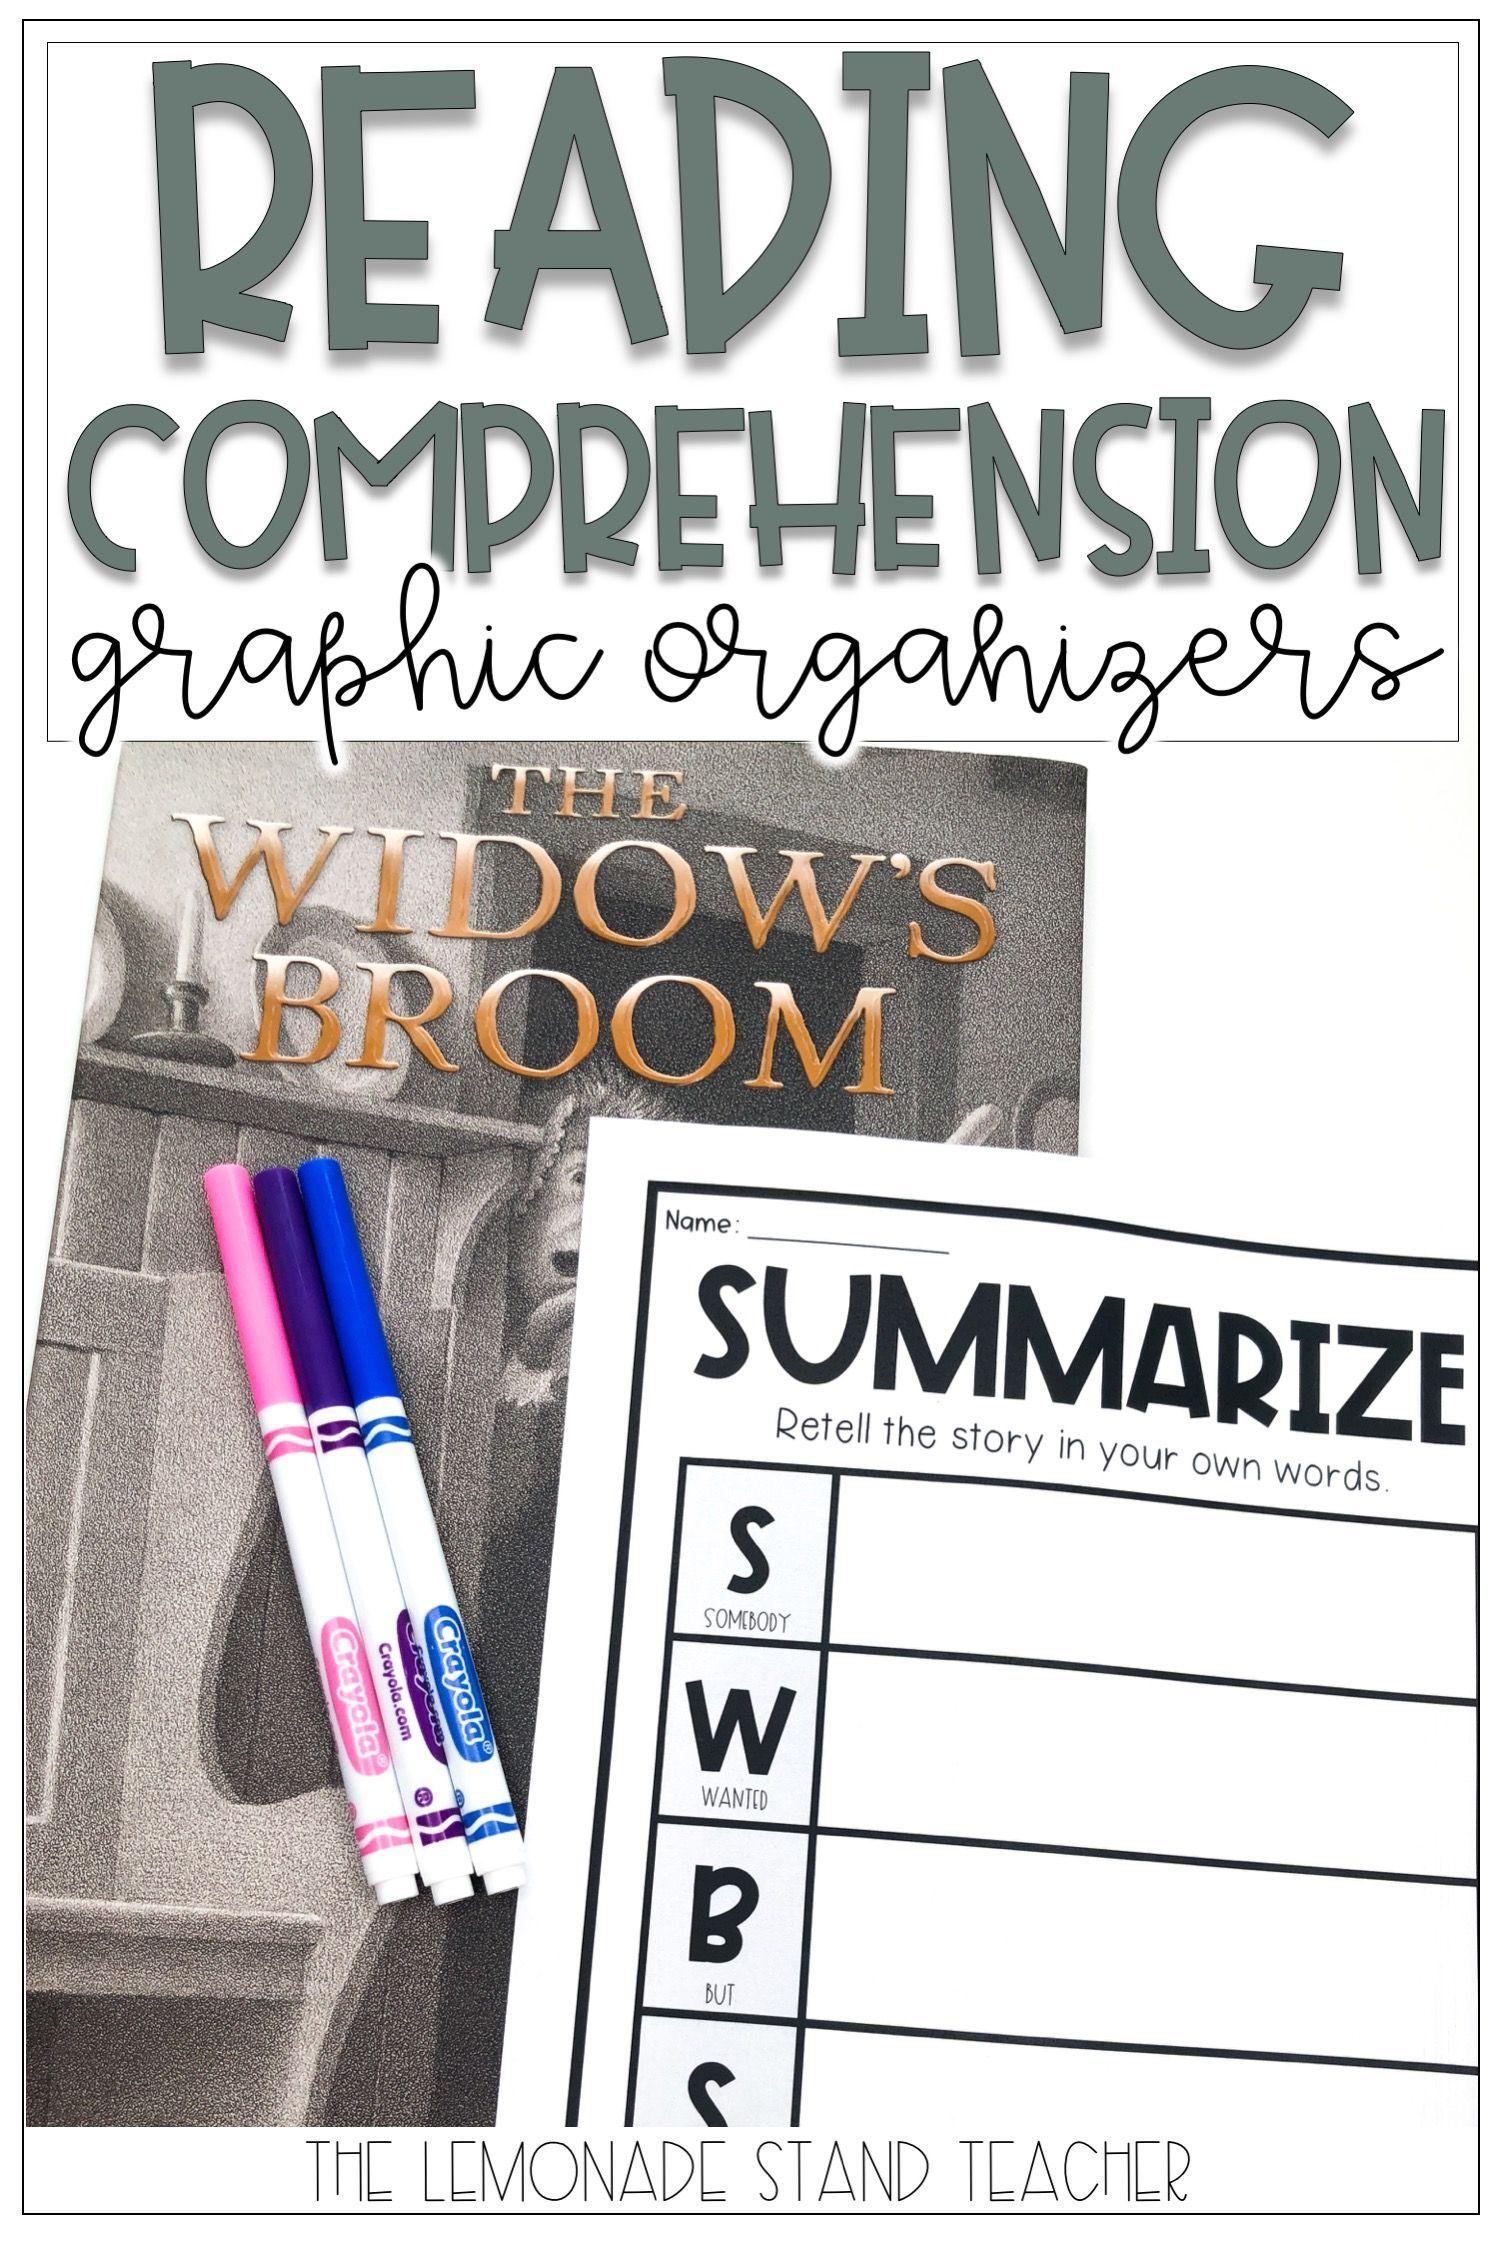 Reading Comprehension Graphic Organizers Reading Comprehension Graphic Organizers Graphic Organizer For Reading 3rd Grade Reading Comprehension Worksheets [ 2249 x 1499 Pixel ]